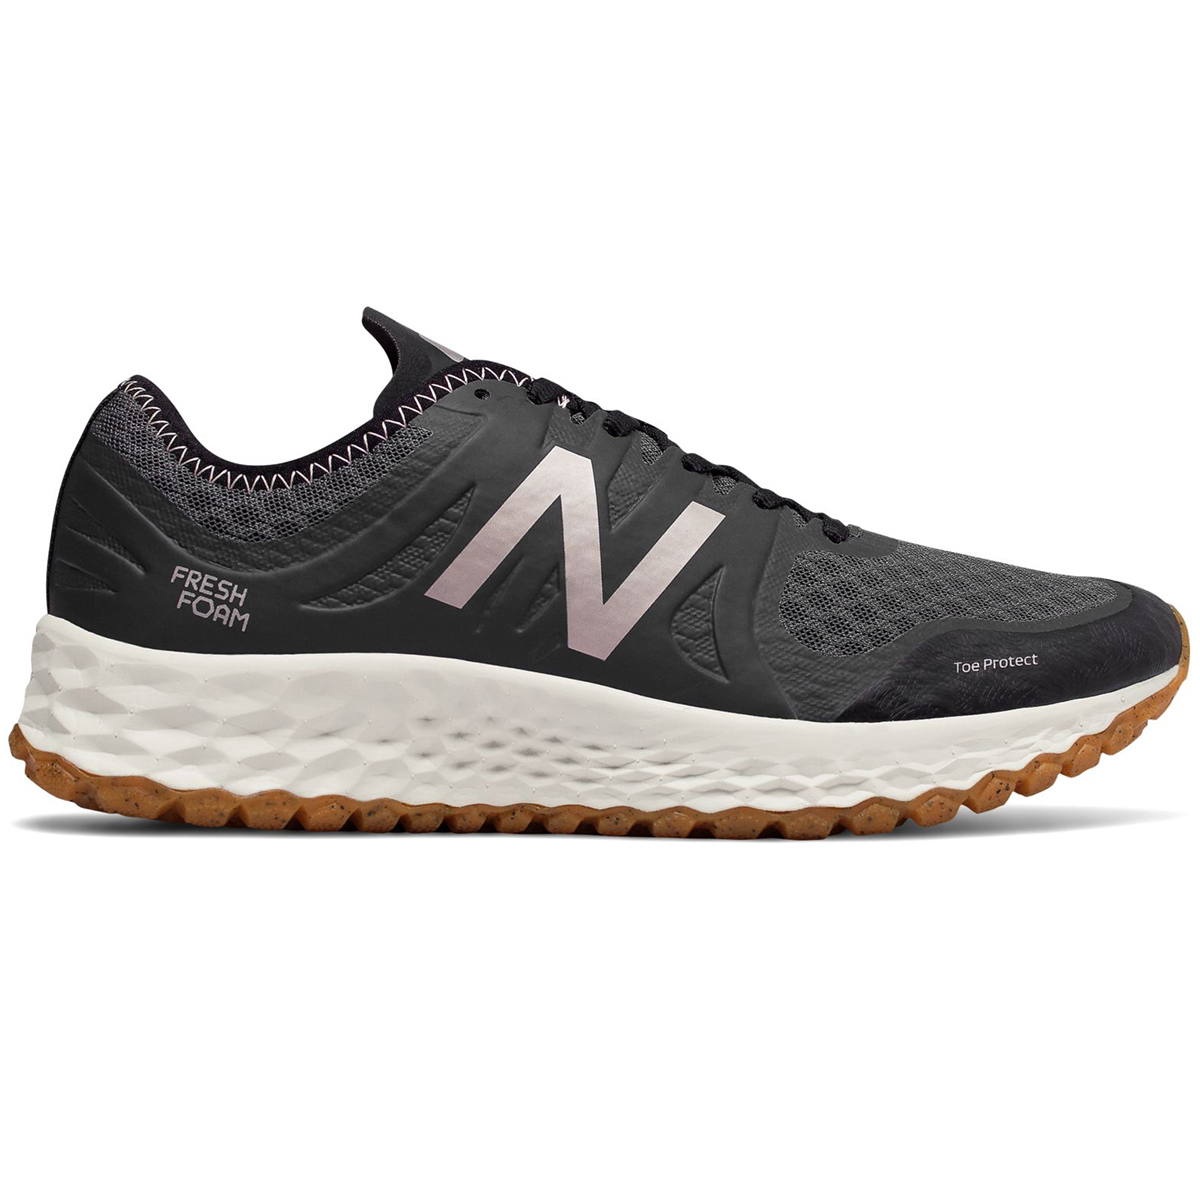 New Balance Women's Fresh Foam Kaymin Trl Trail Running Shoes - Black, 9.5